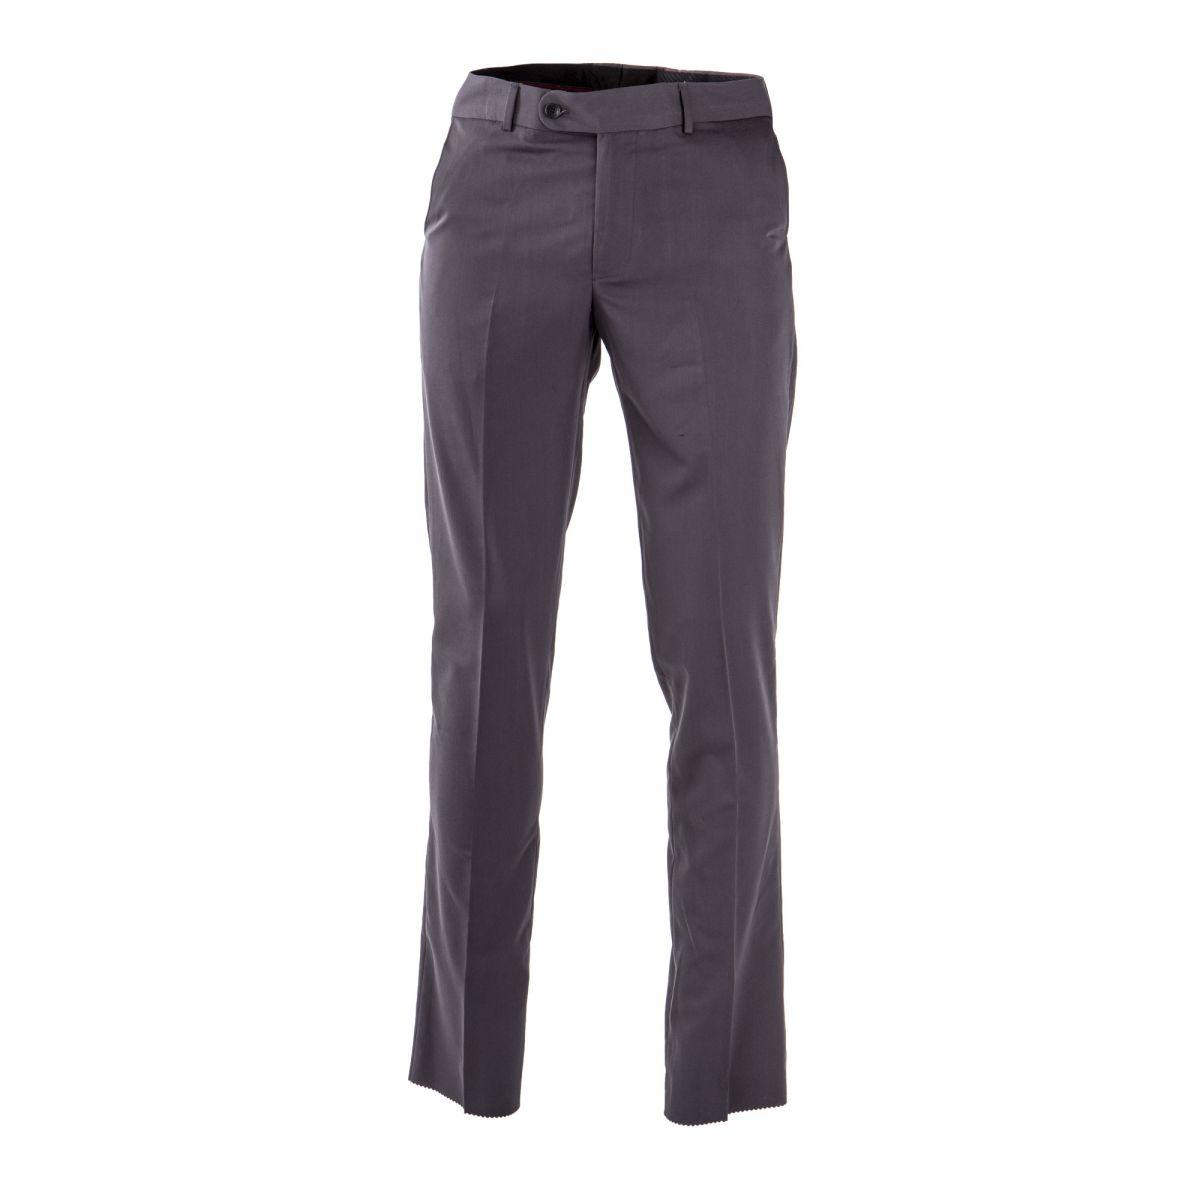 pantalon de costume gris anthracite homme marion roth prix d griff. Black Bedroom Furniture Sets. Home Design Ideas